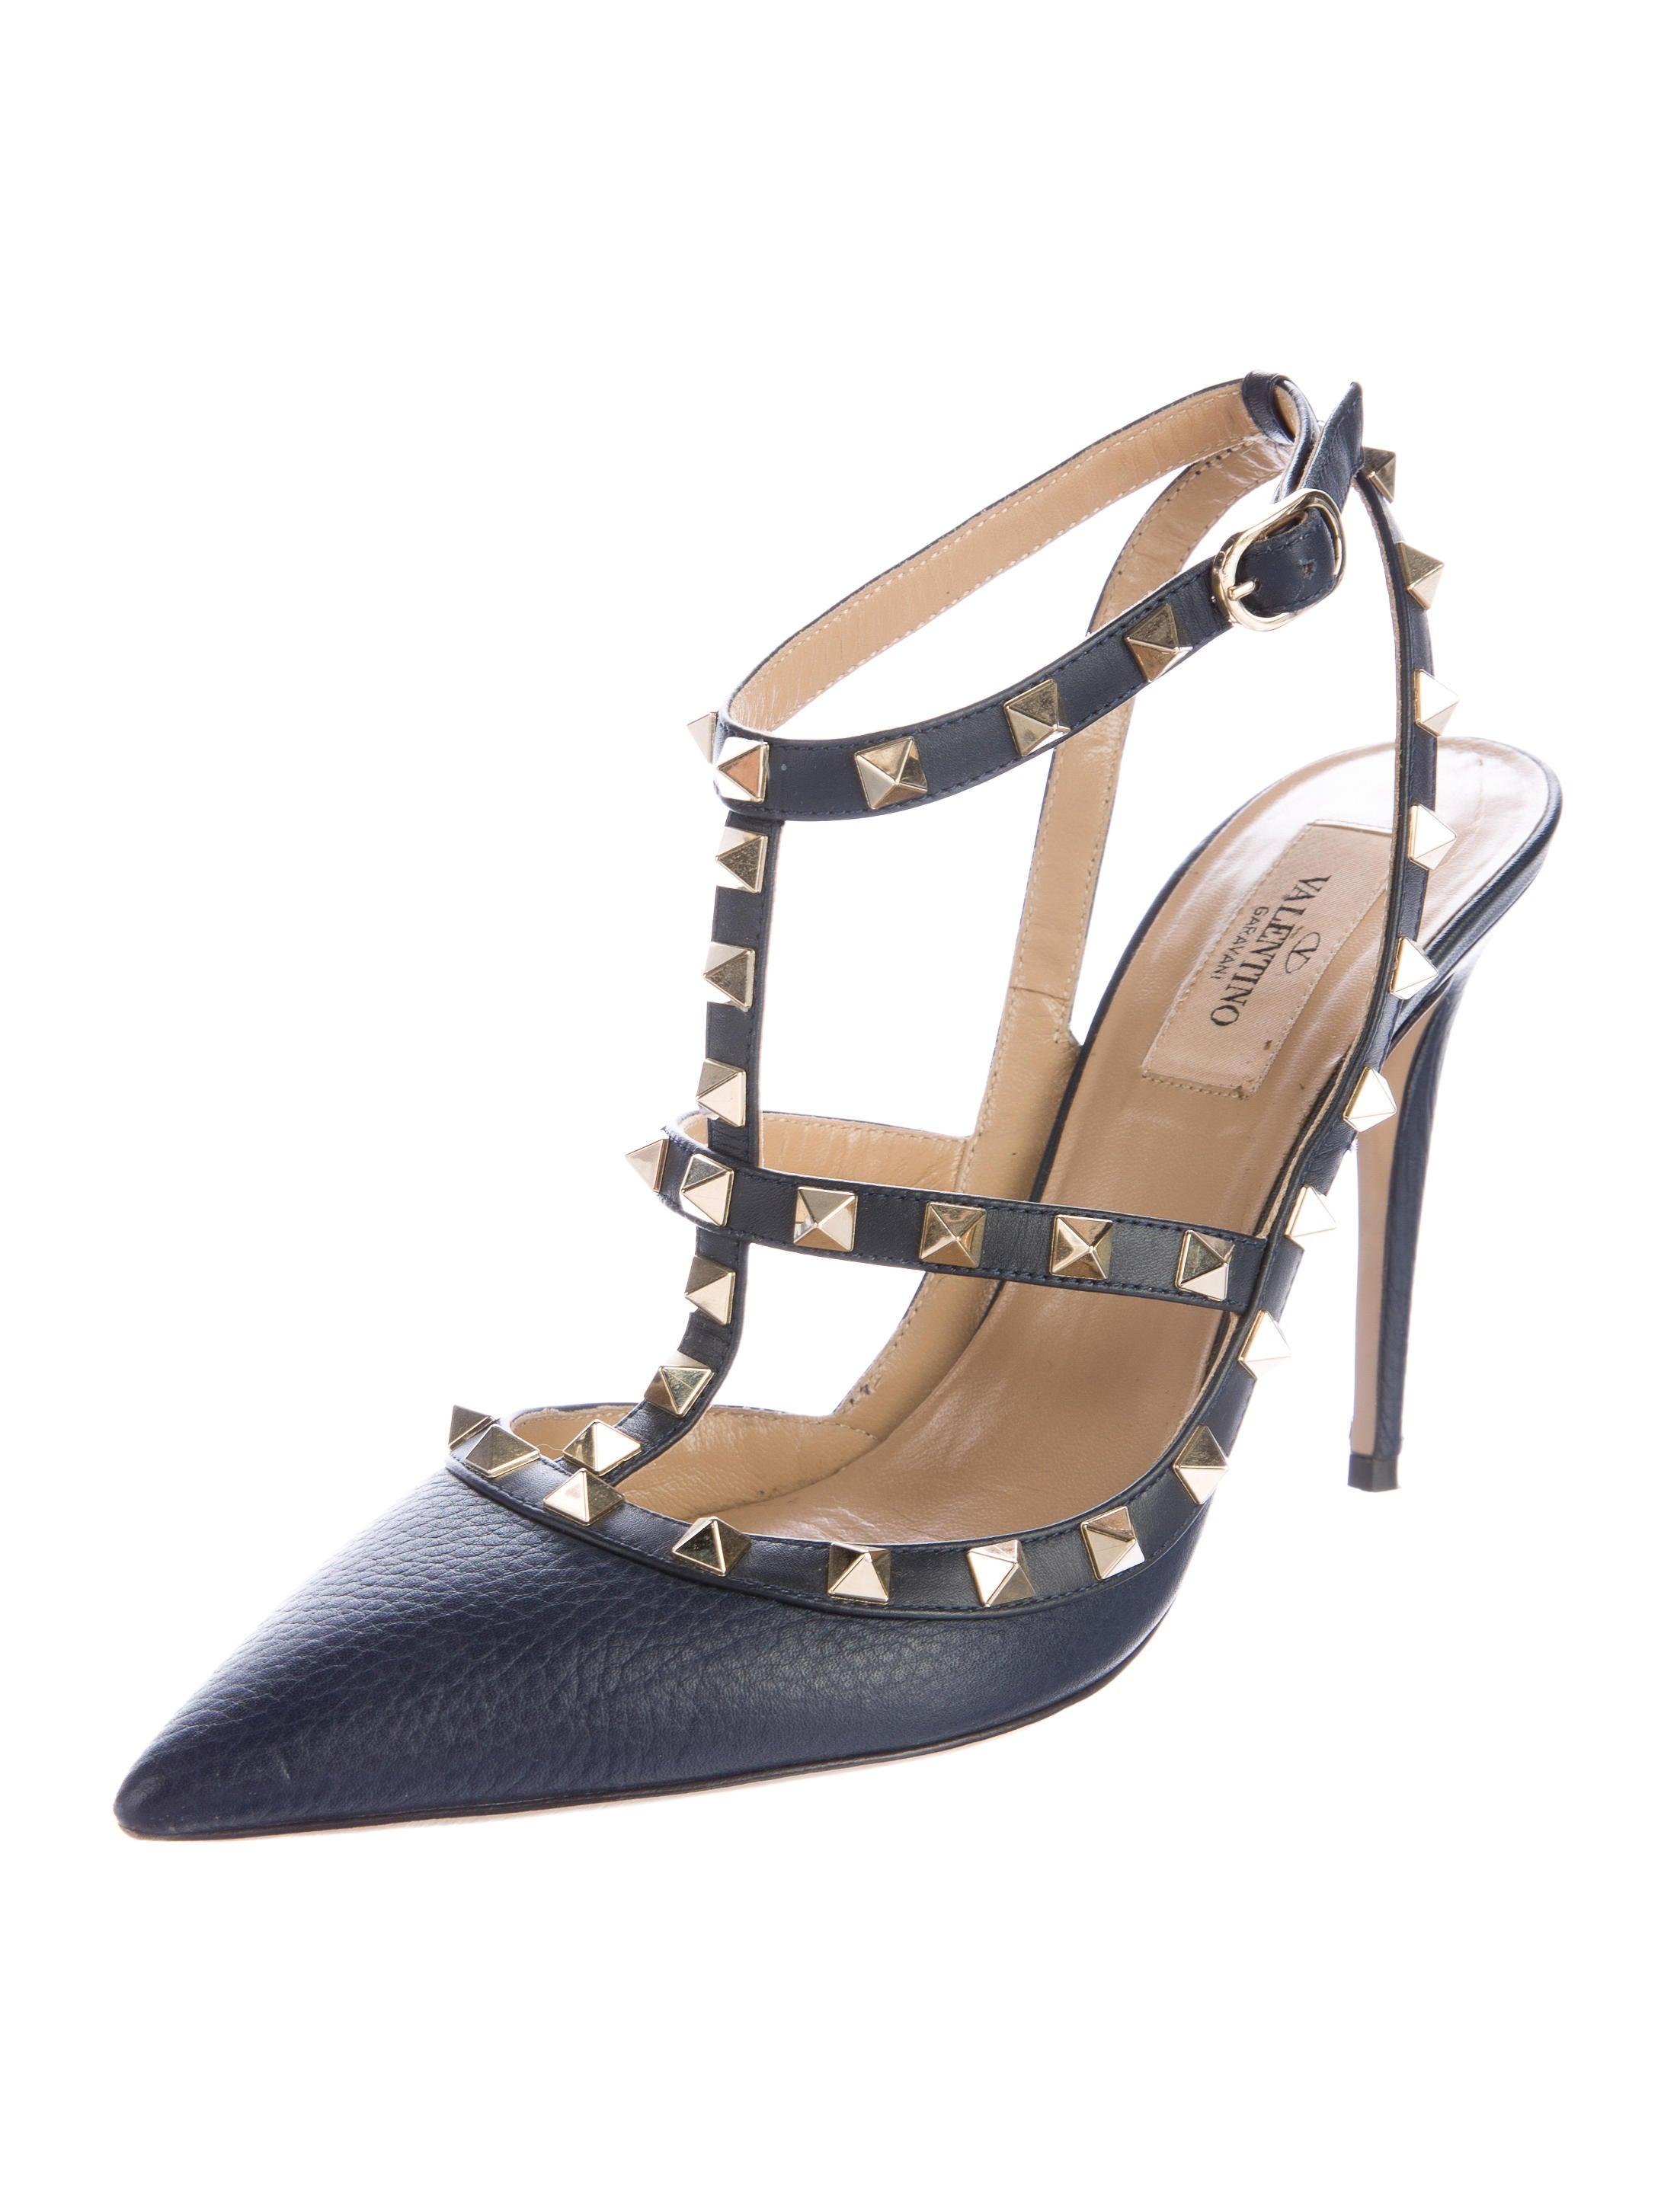 valentino rockstud pointed toe pumps shoes val64336. Black Bedroom Furniture Sets. Home Design Ideas